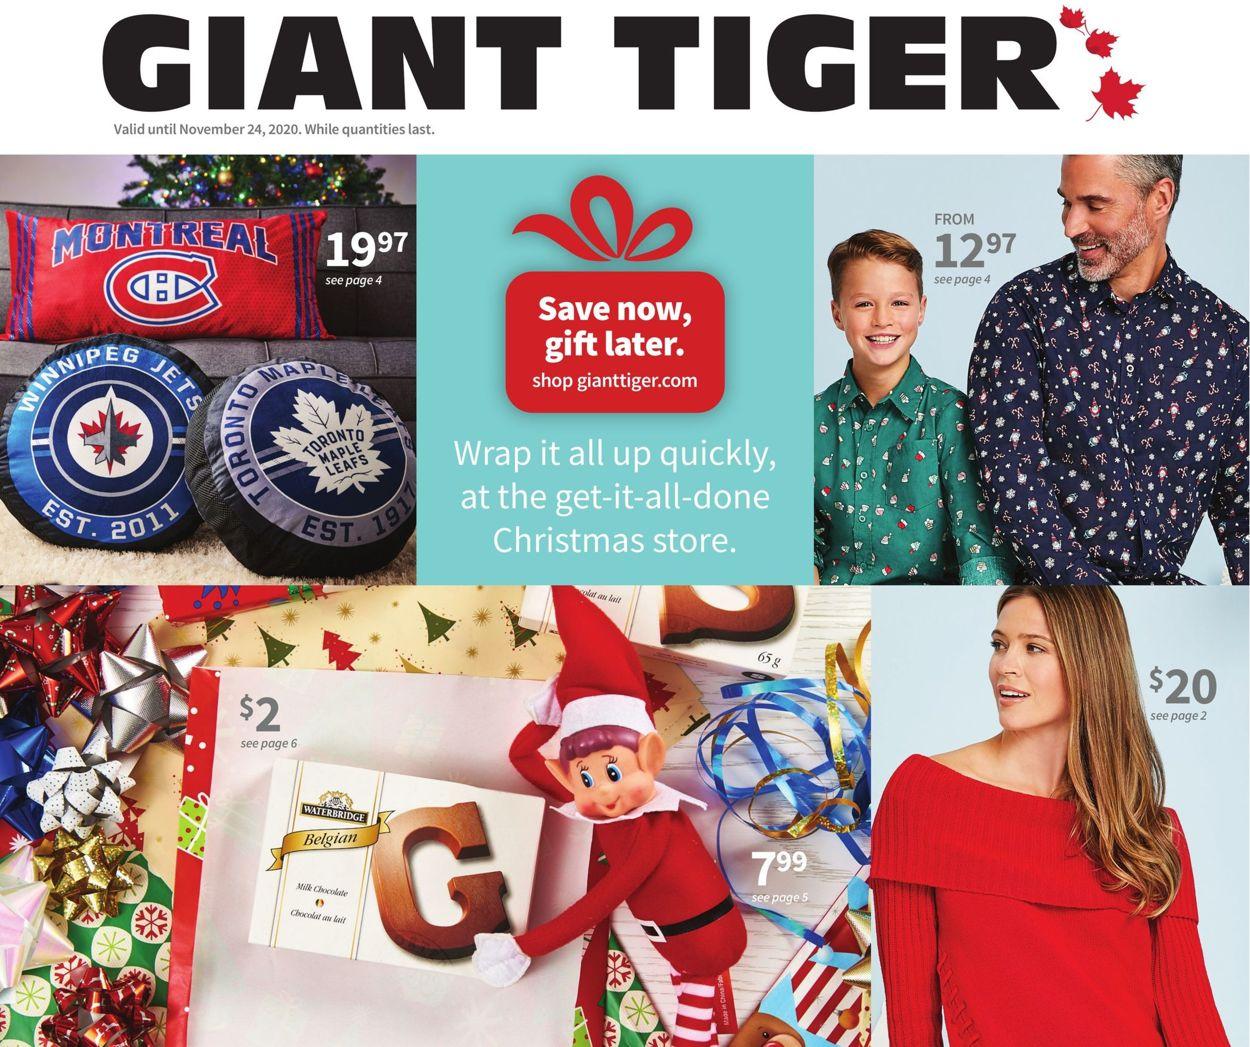 Giant Tiger - Christmas 2020 Flyer - 11/11-11/24/2020